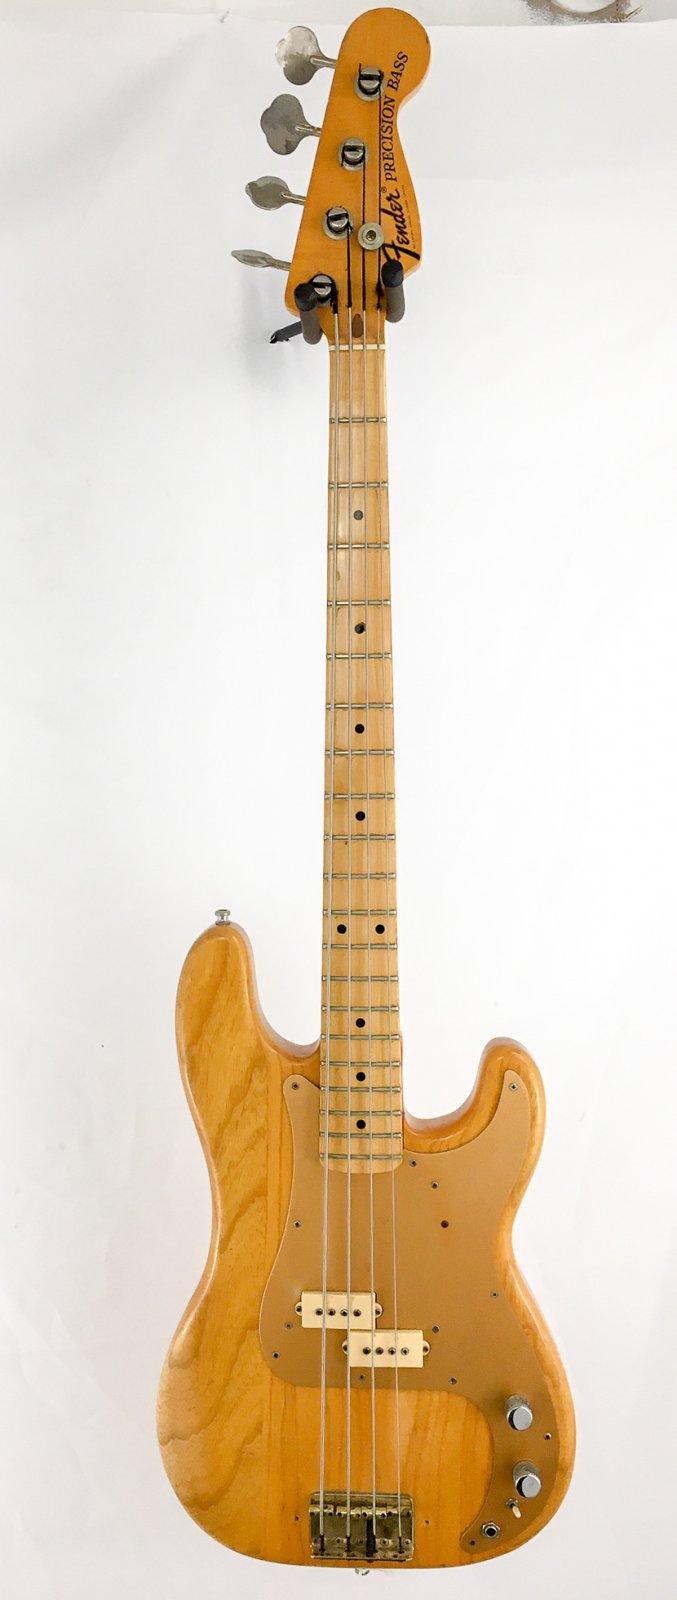 Vintage 1972 Fender Precision Bass